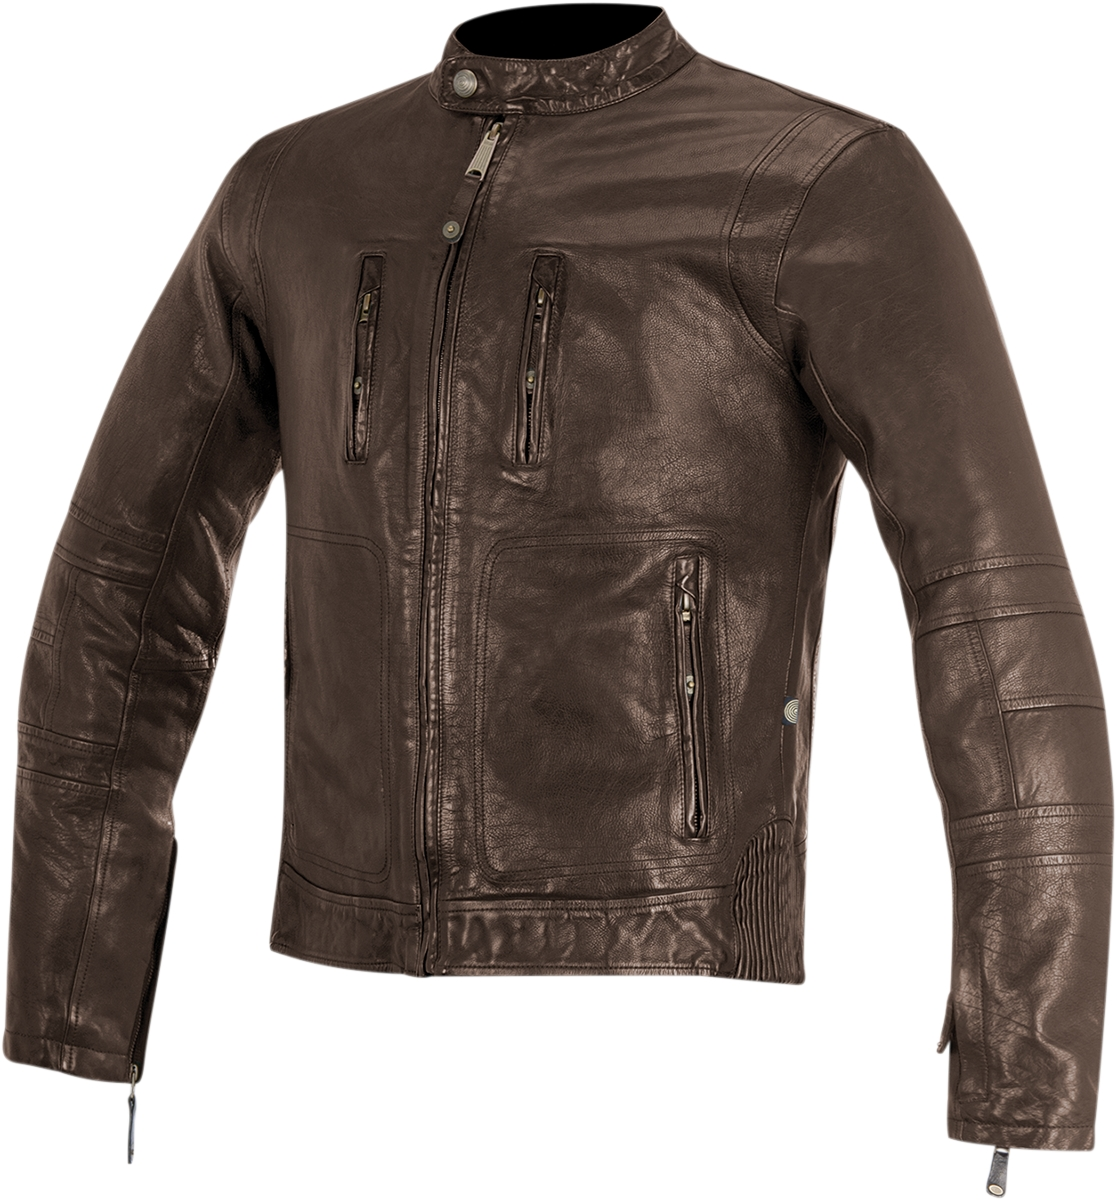 Alpinestars Brass Leather Jacket Brown XL  3108515-810-XL